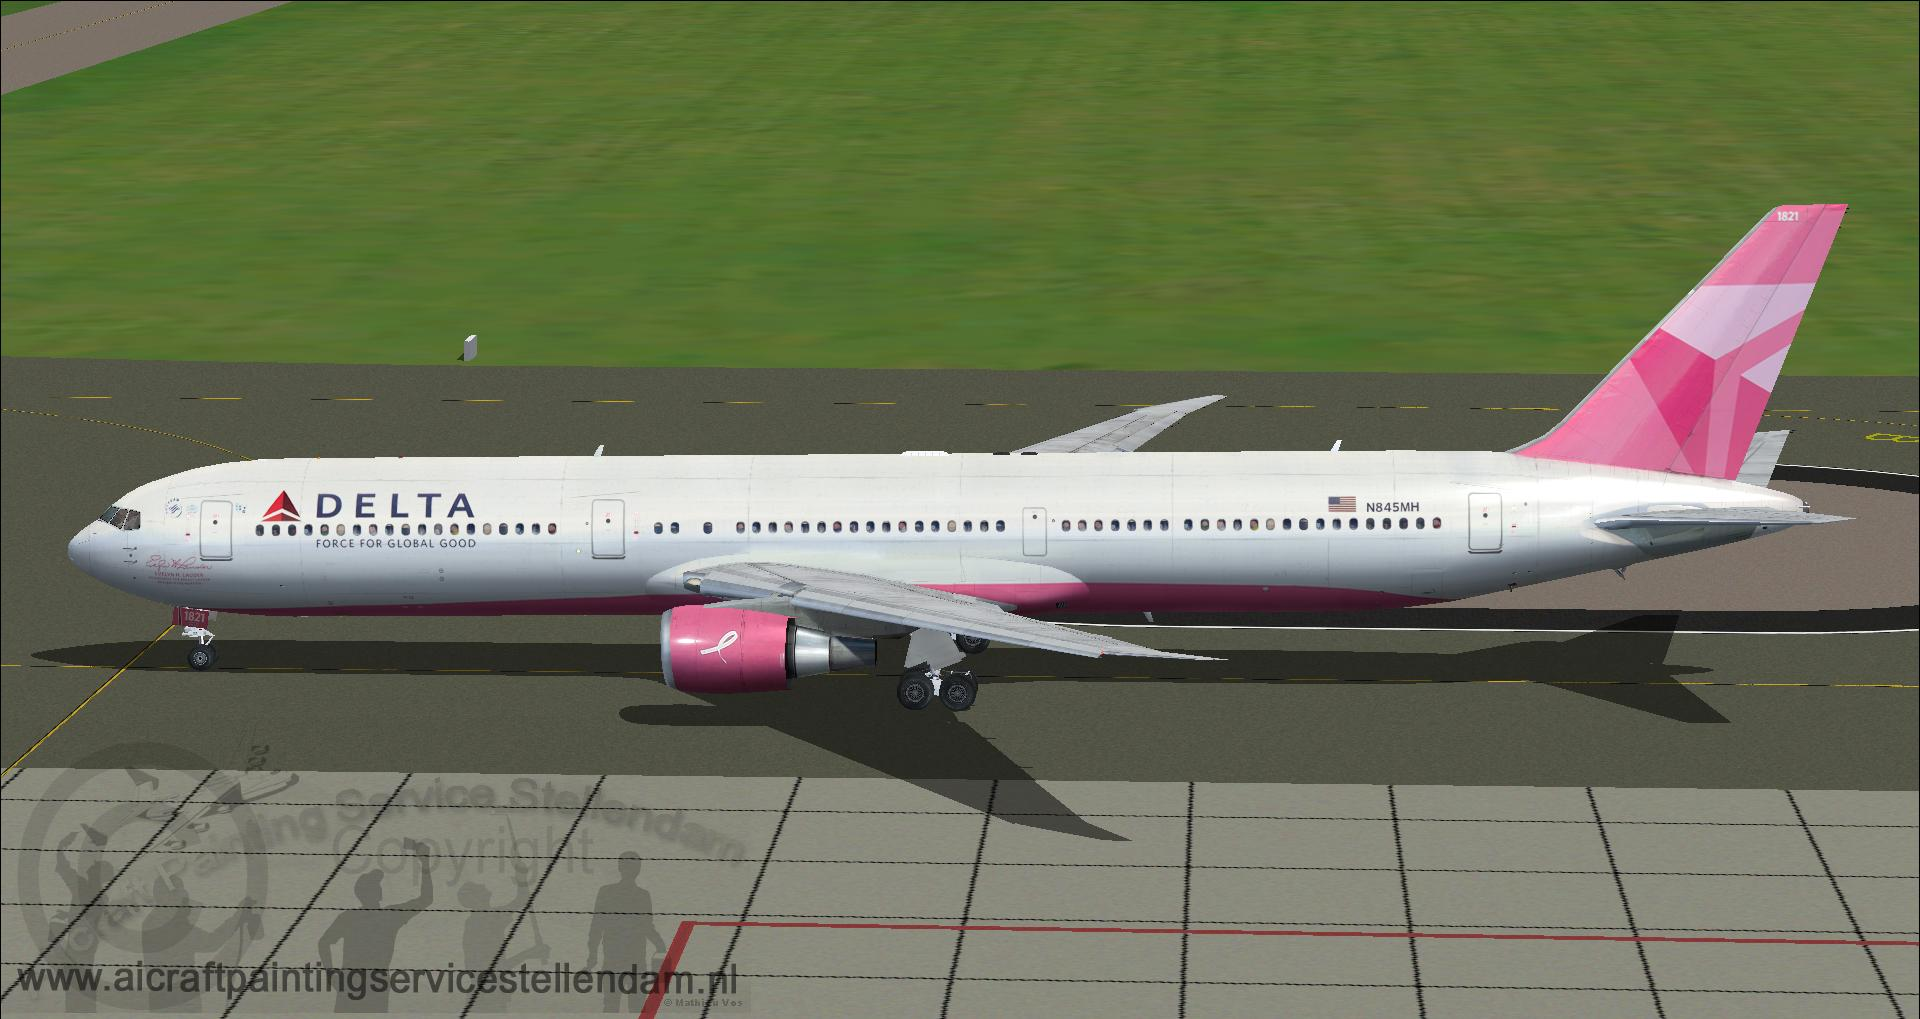 SkySpirit2010BoeingB767-432ER_Delta_Air_Lines_Breast_Cancer_Awareness_N845MH